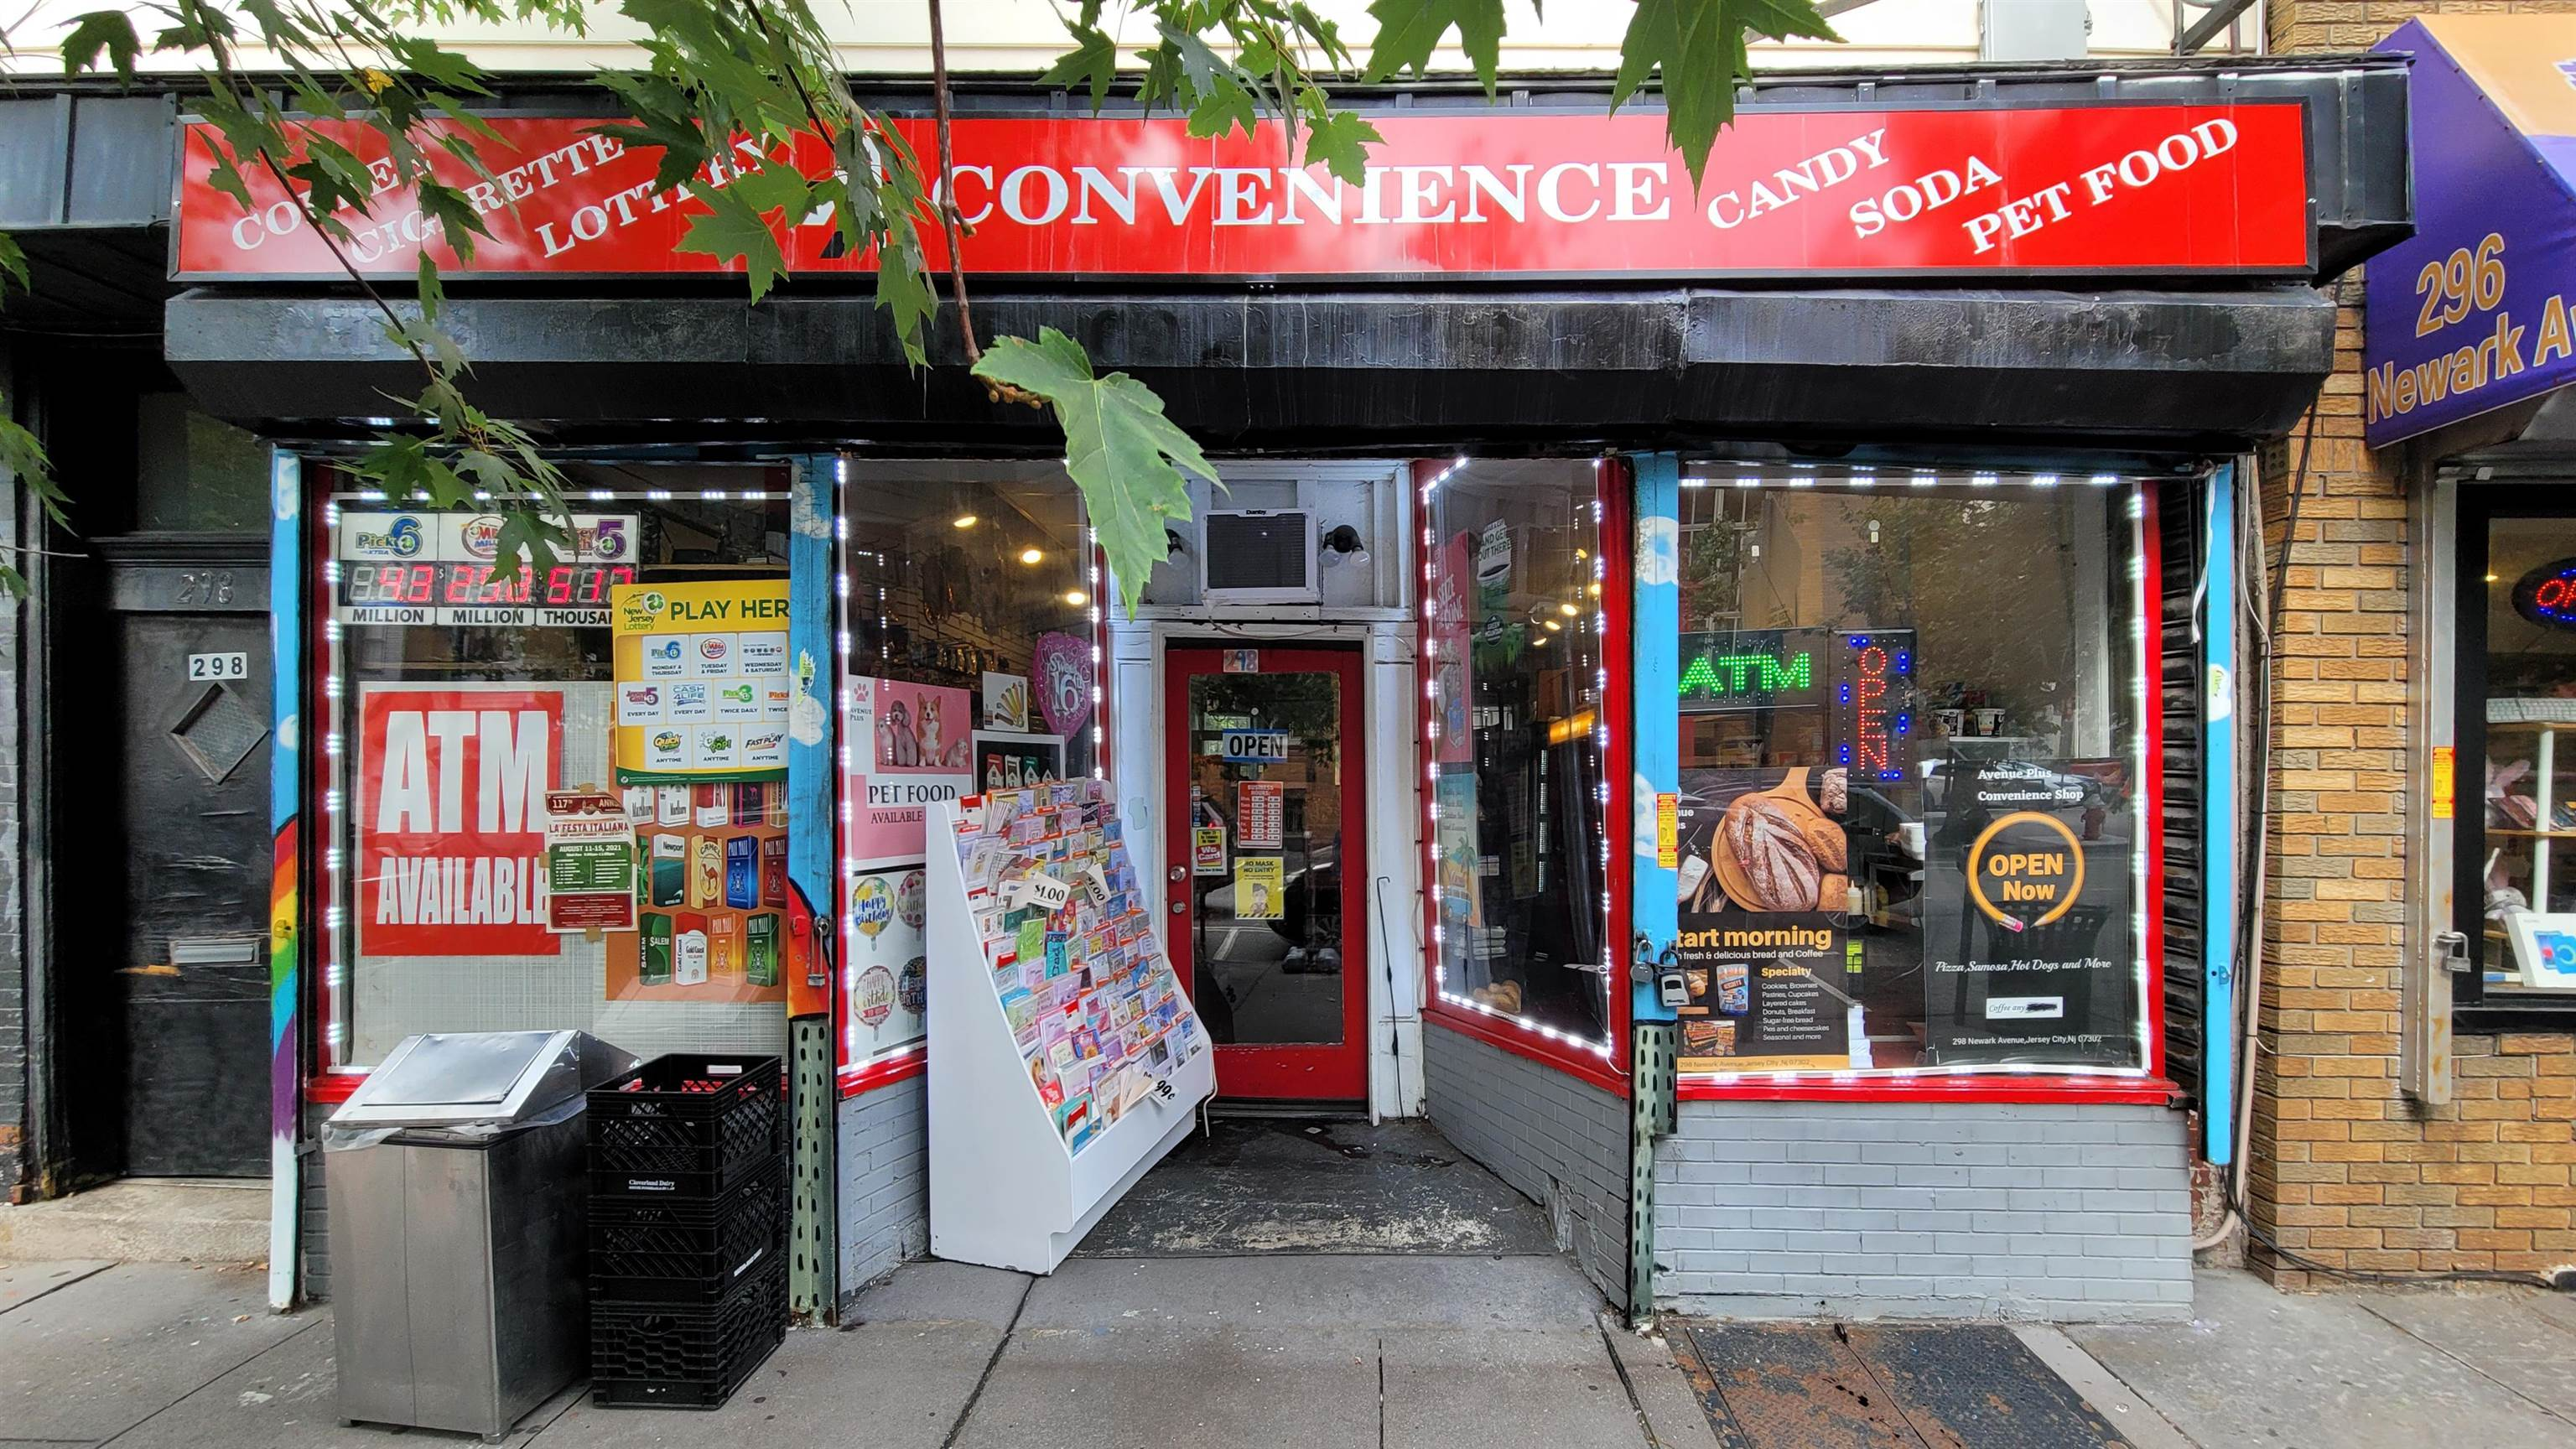 298 NEWARK AVE, JC, Downtown, NJ 07302